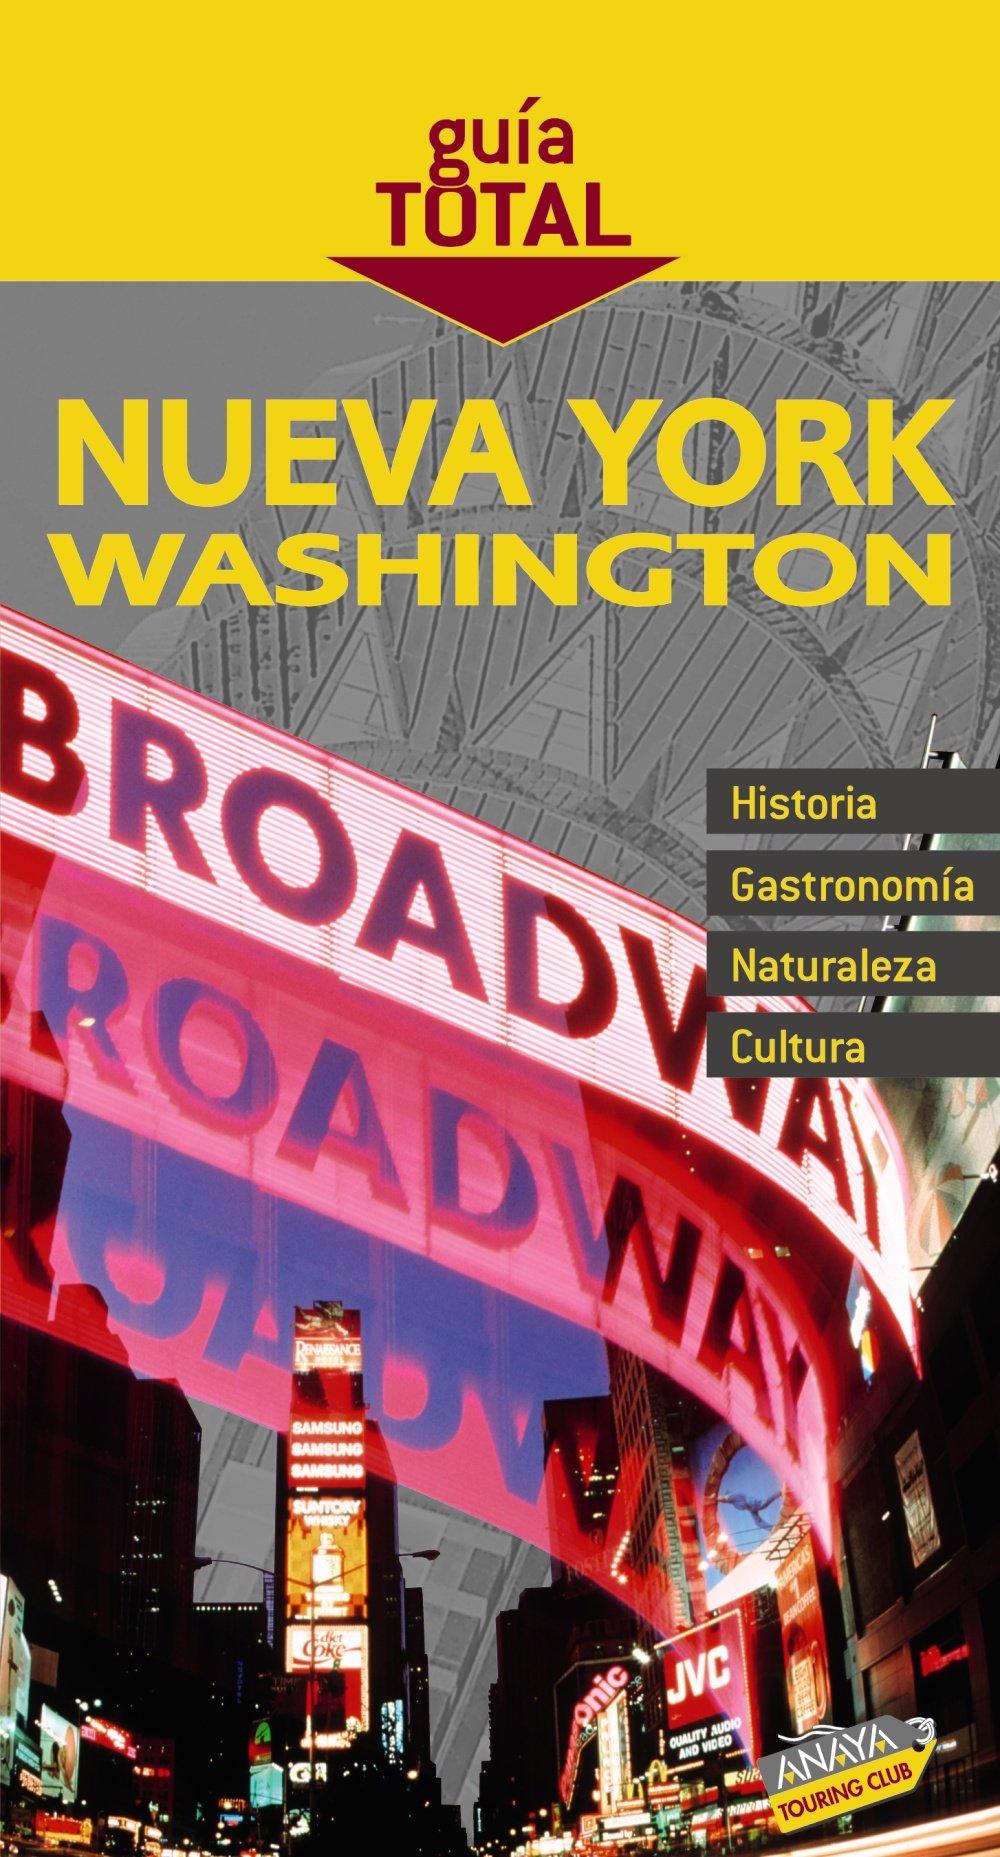 Nueva York Washington / New York Washington (Guia Total / Total Guide) (Spanish Edition) PDF